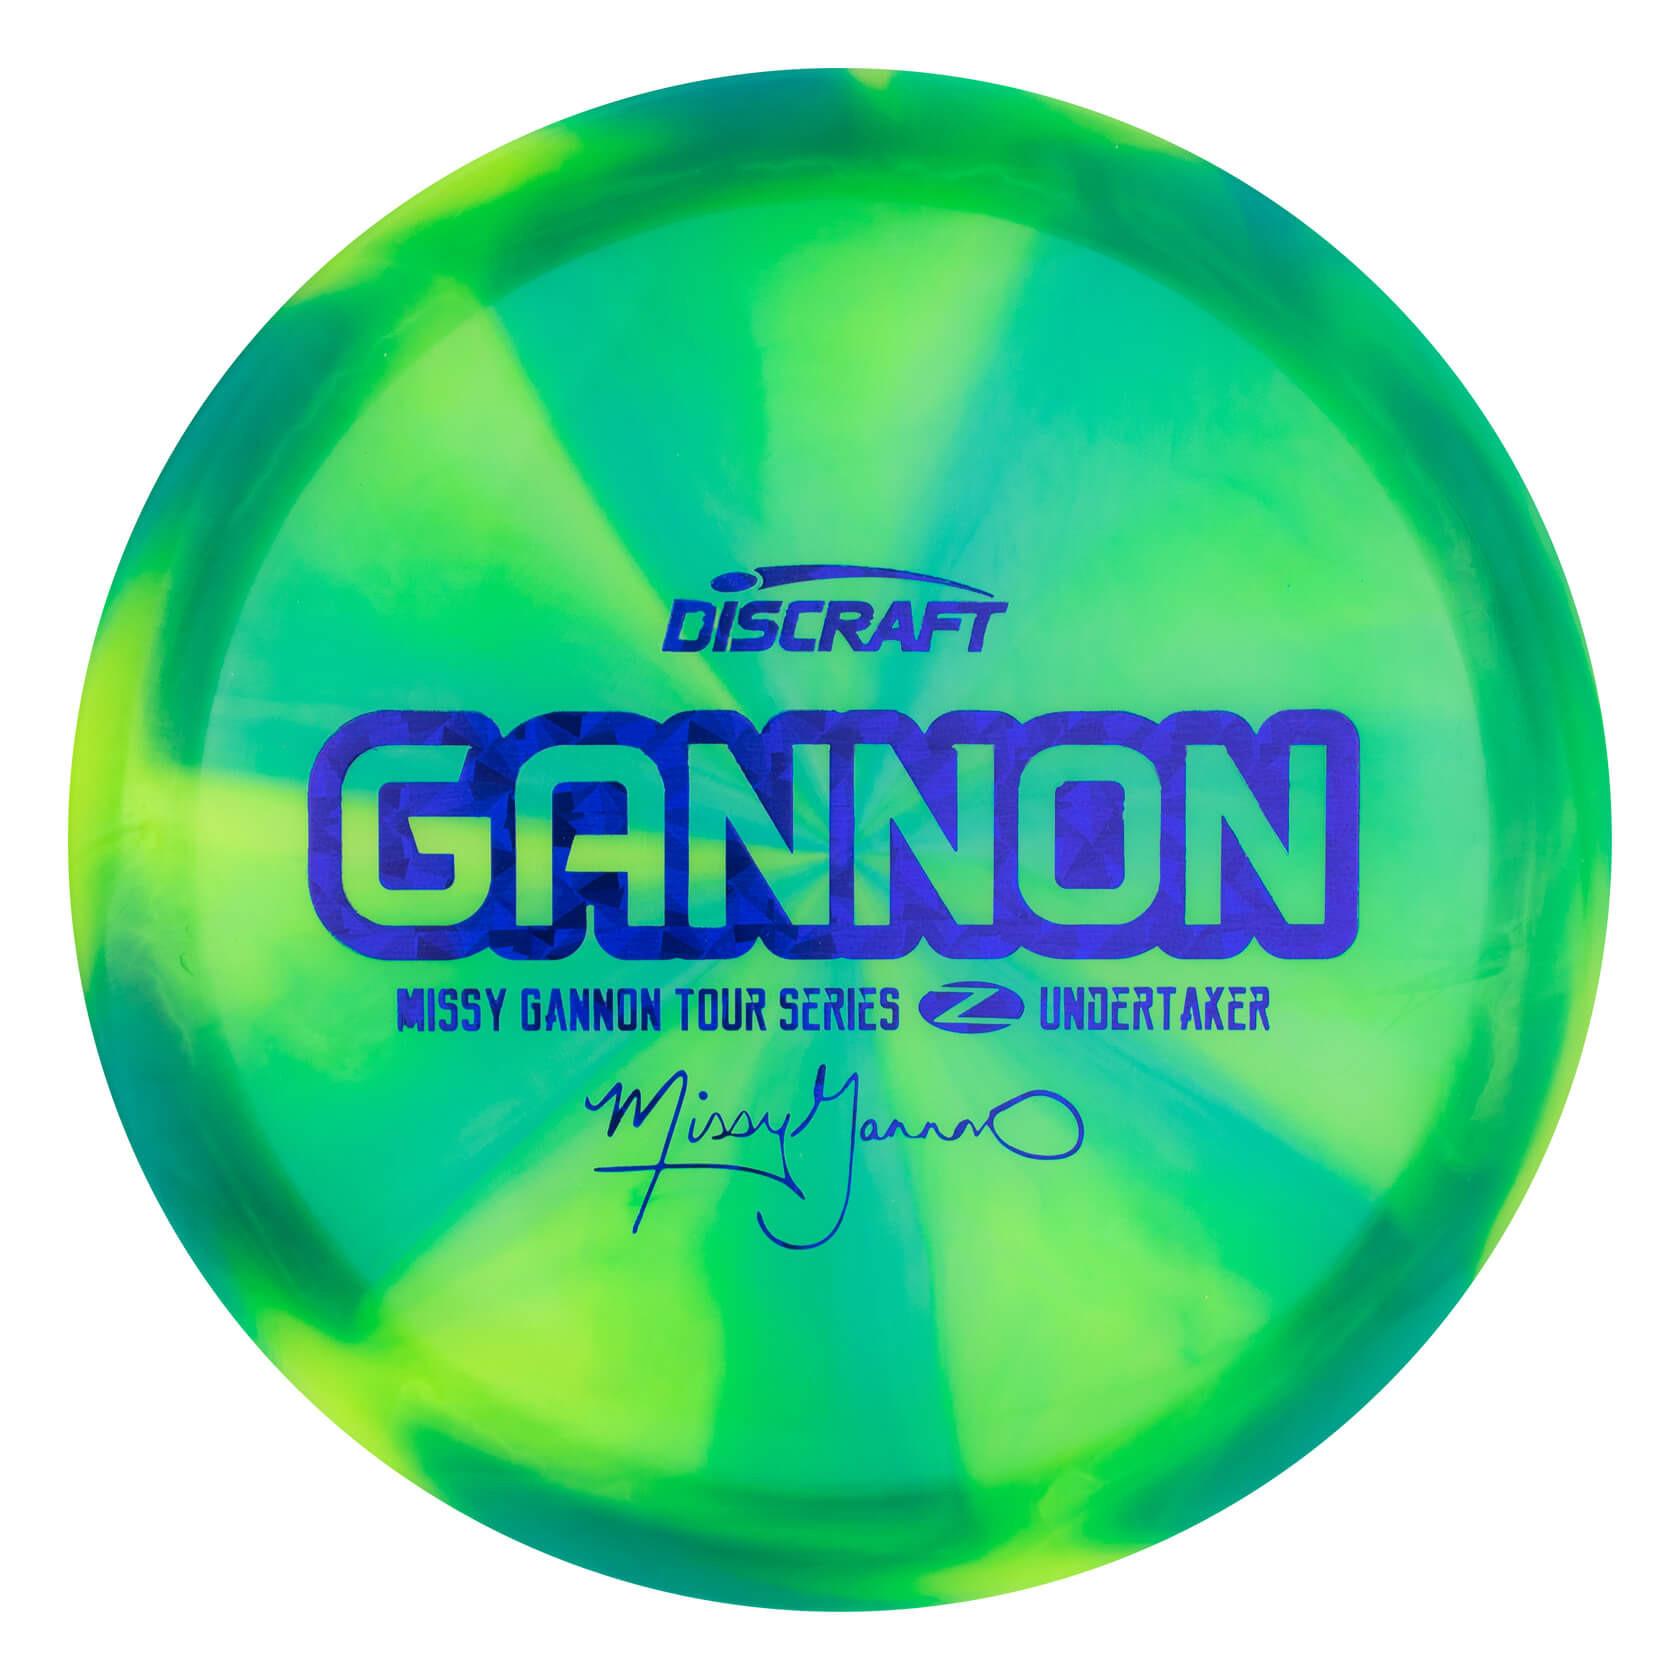 Discraft Swirly Z Undertaker Missy Gannon Tour Series